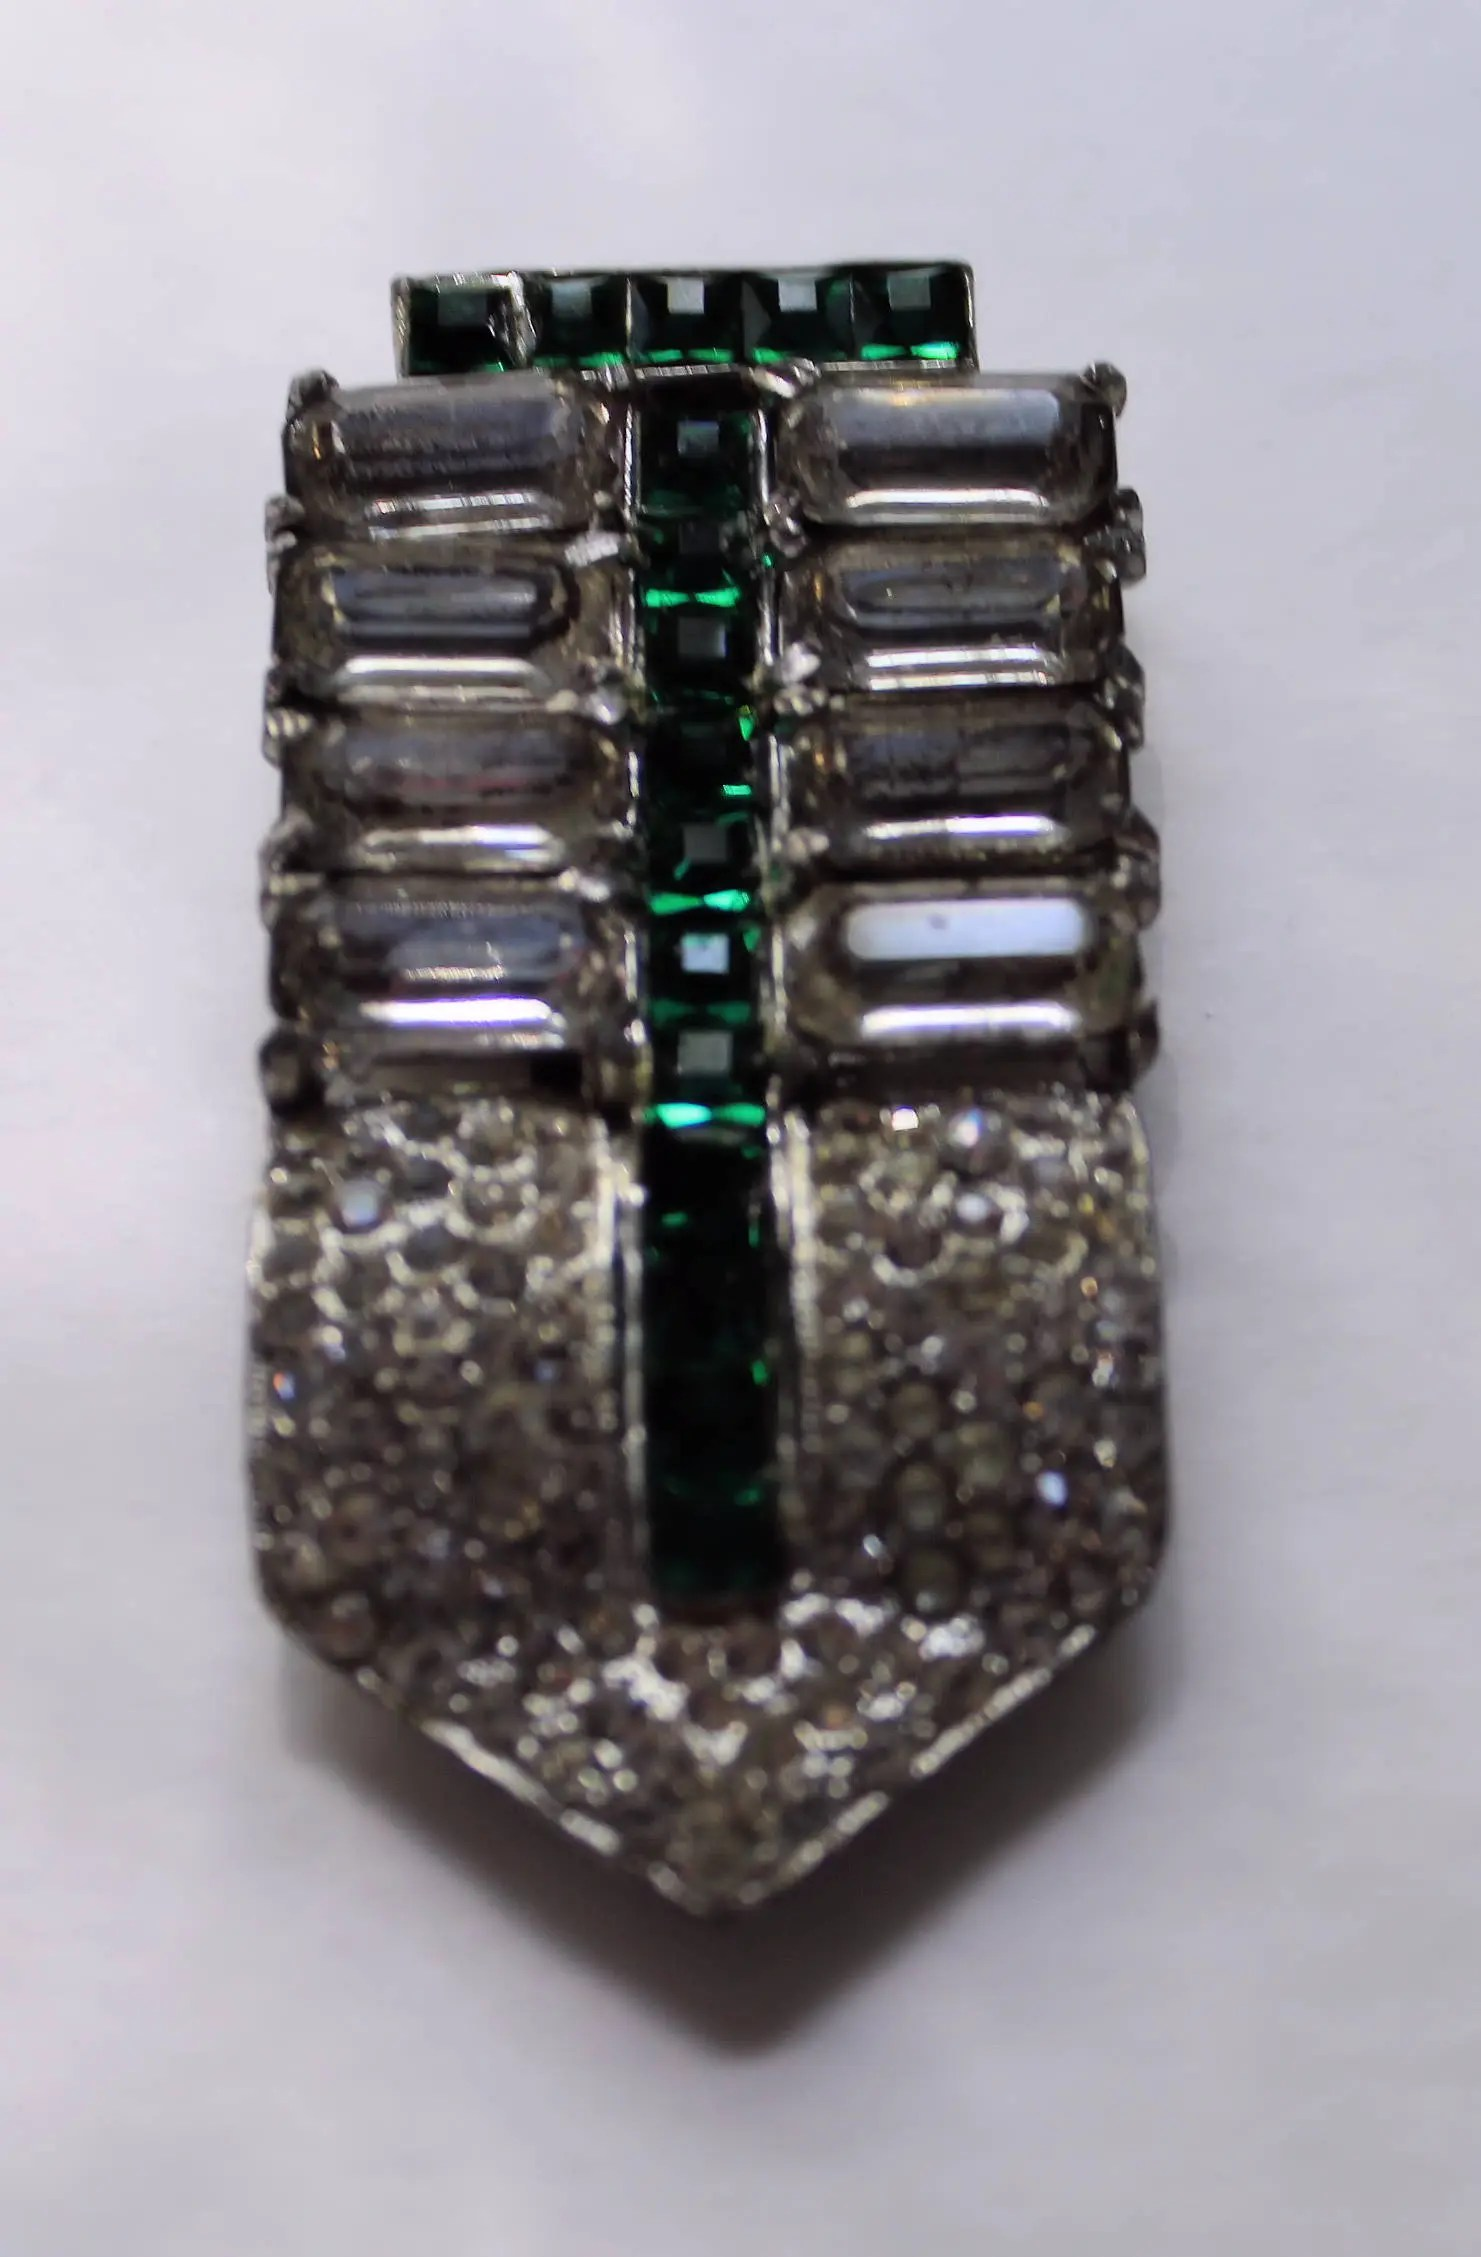 First Vintage Art Deco Emerald Dress Clip Art Deco Jewelry Rhinestone Jewelryrhinestone Dress Clip Vintage Art Deco Emerald Dress Clip Art Deco Jewelry Rhinestone wedding jewelry Art Deco Jewelry